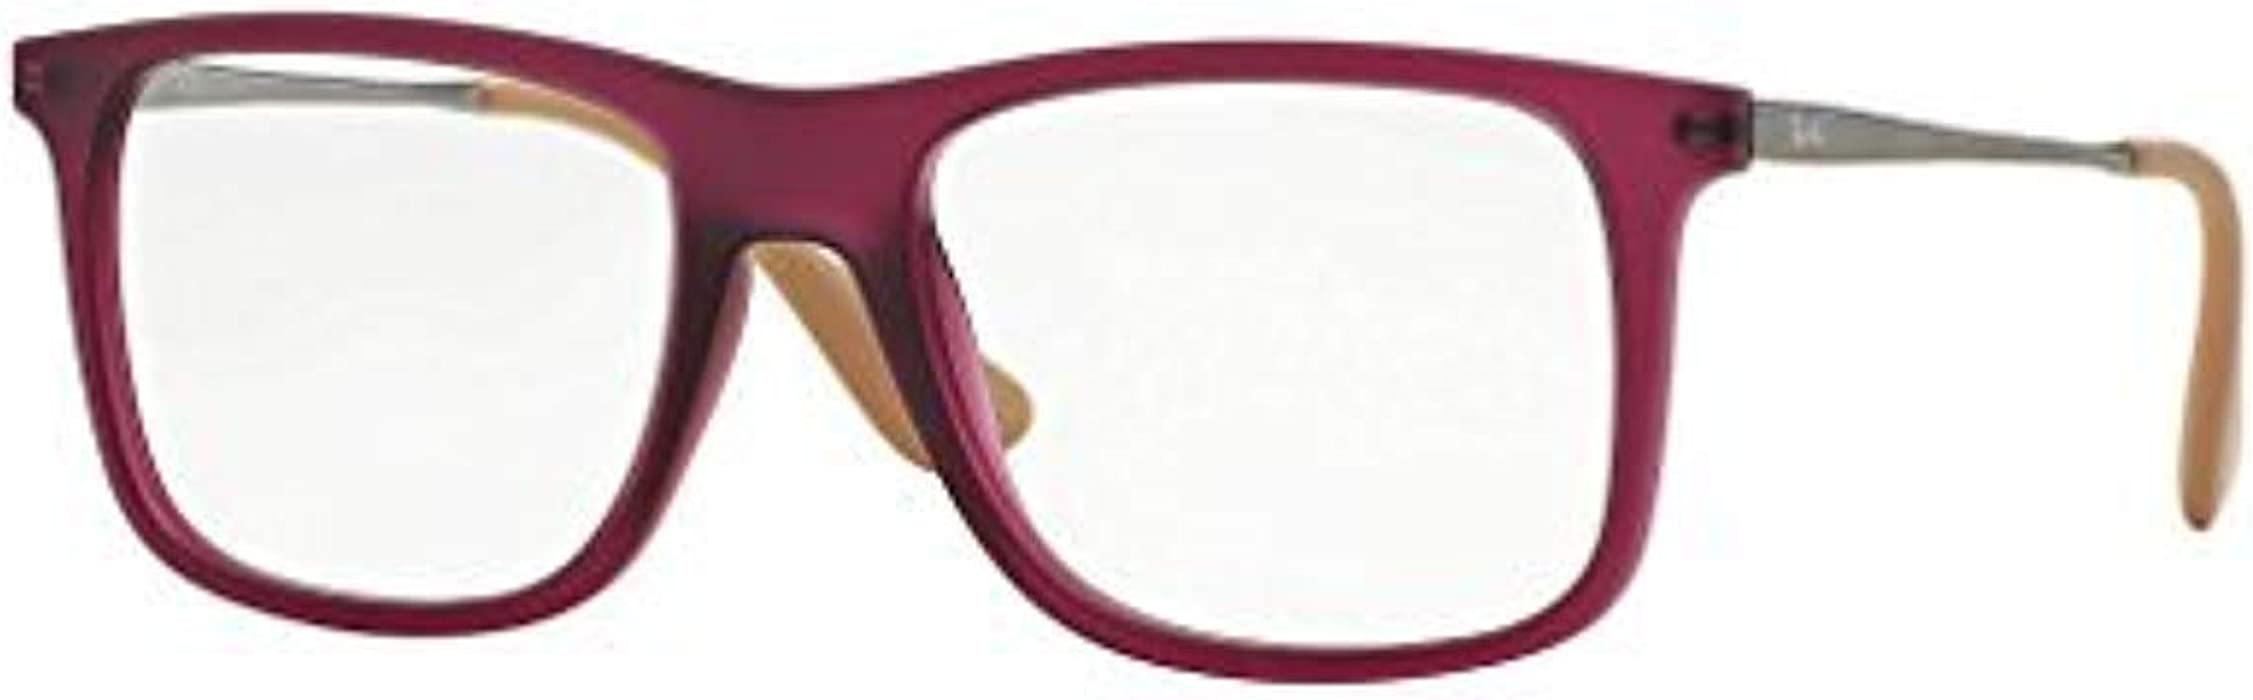 bed0a340cee Amazon.com  Ray-Ban Vista RX 7054 5526 Eyeglasses Rubber Violet ...